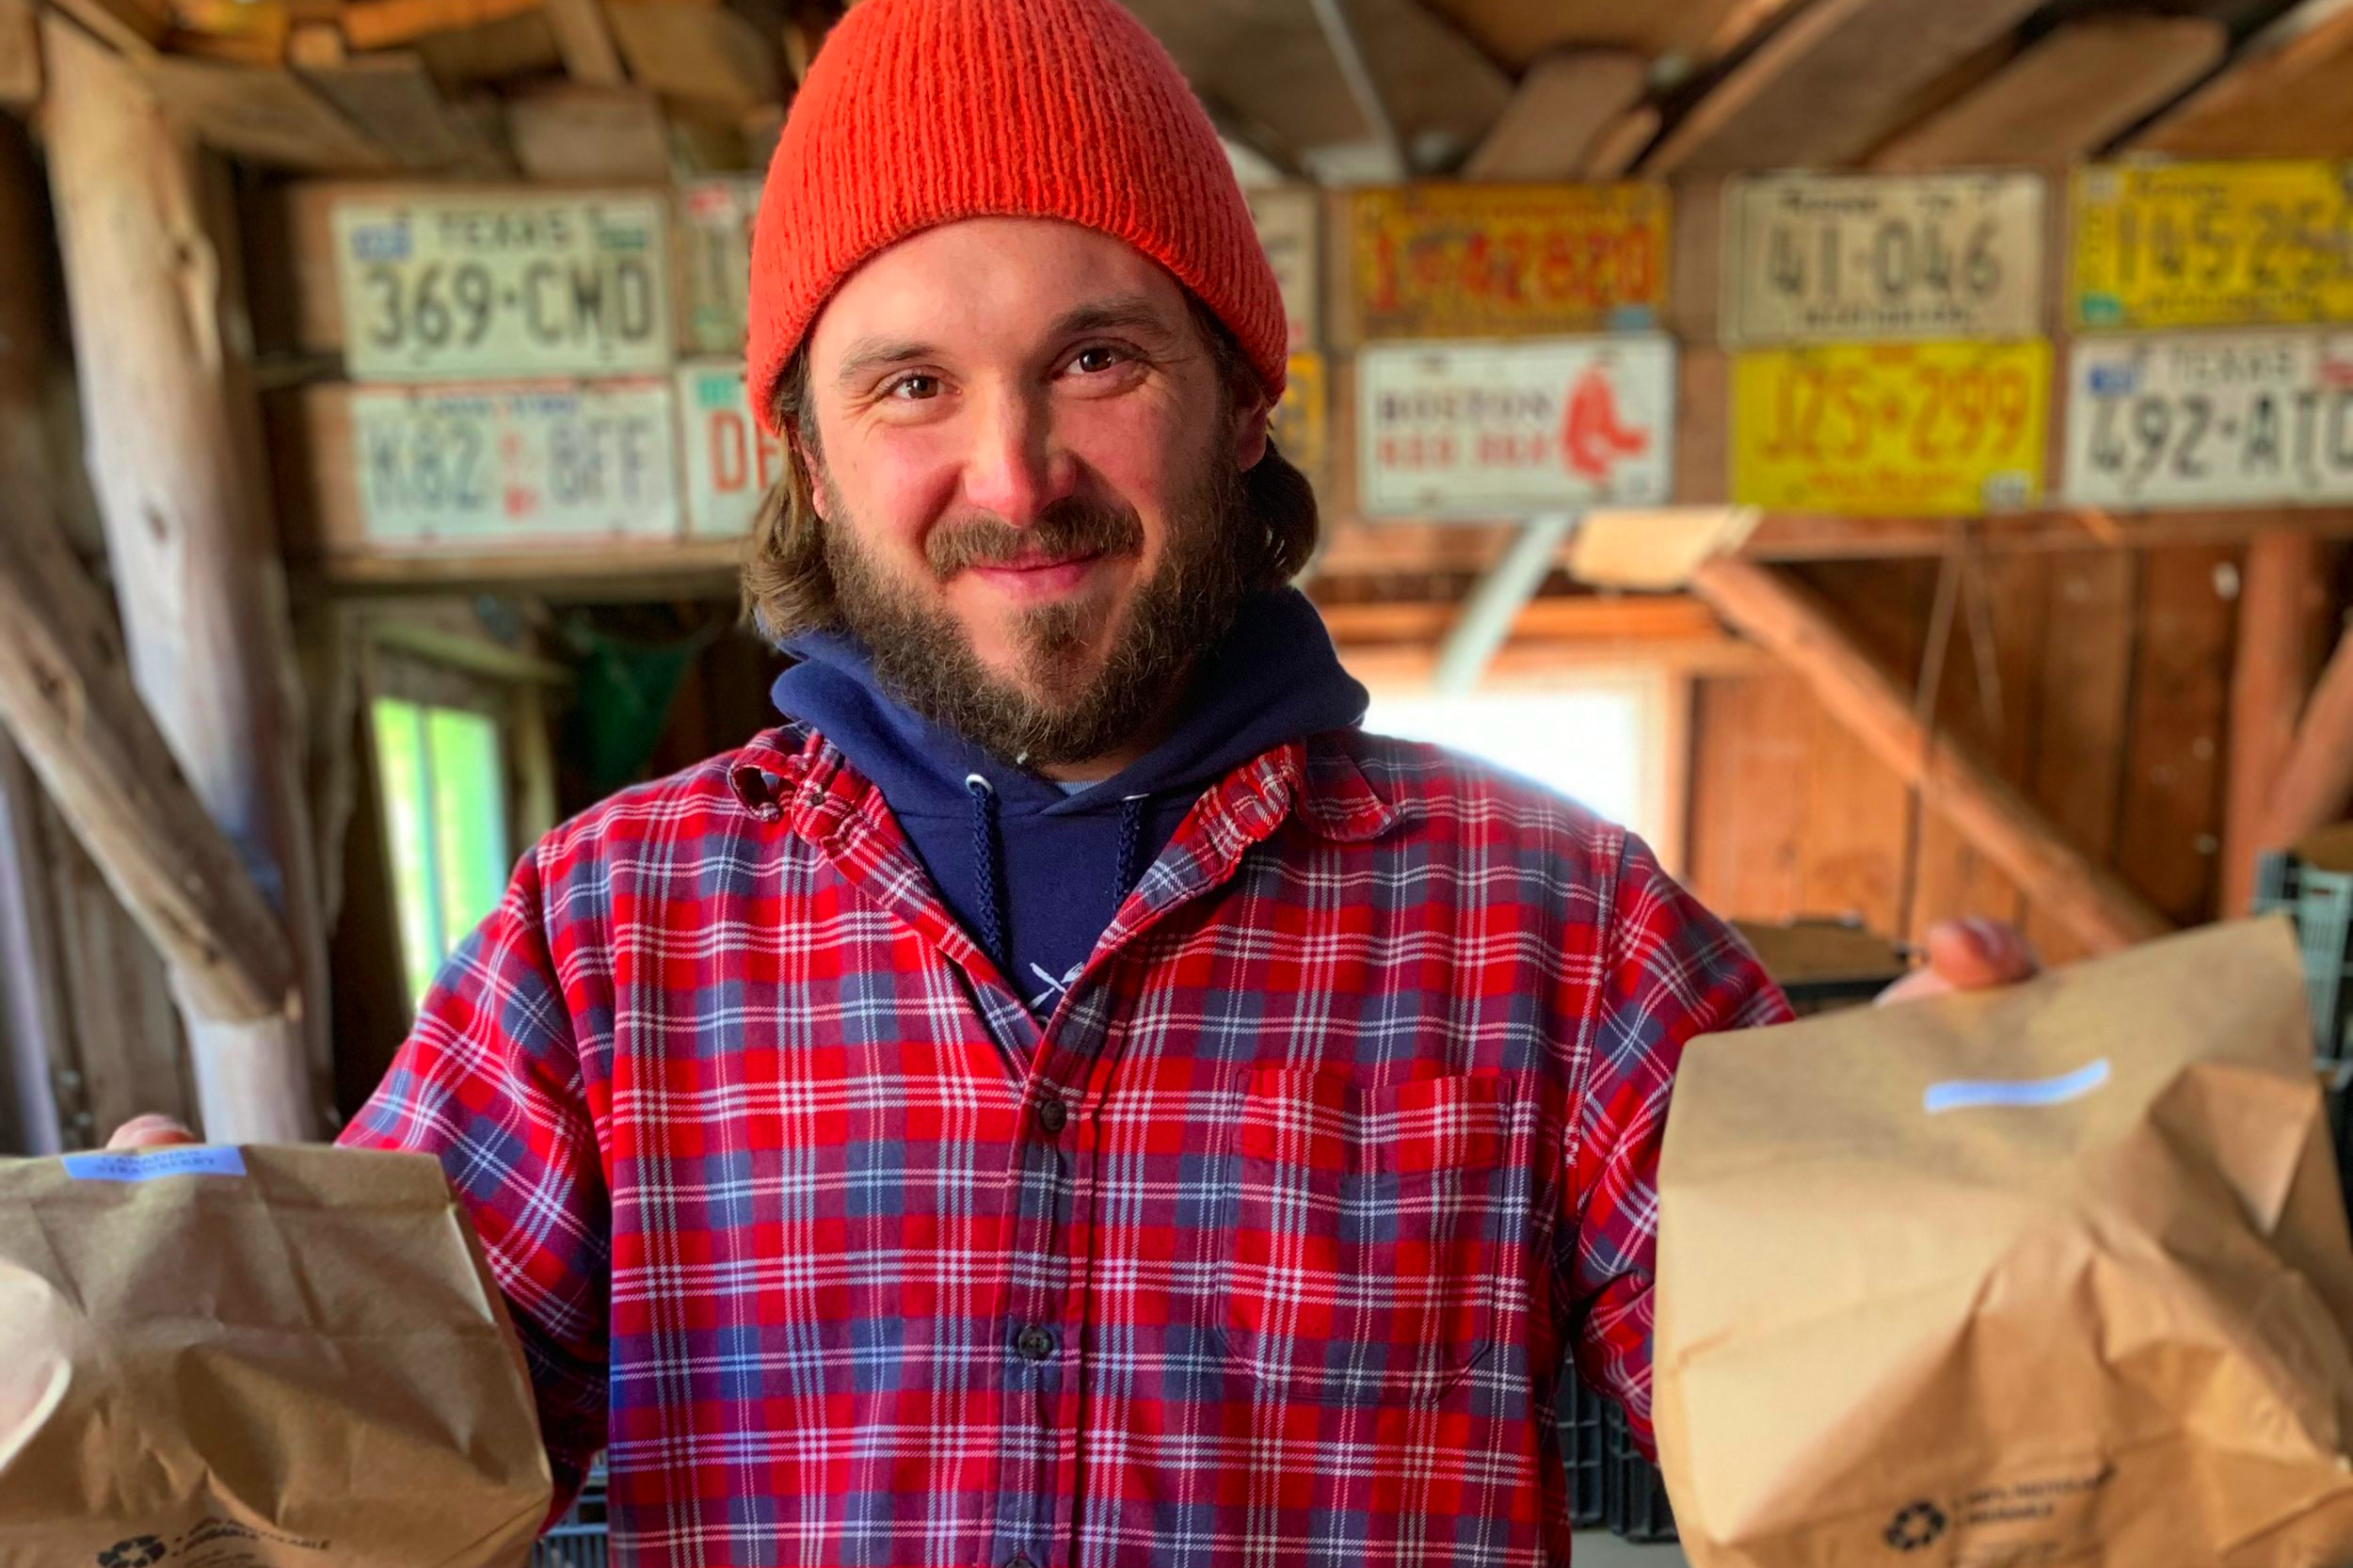 Steve packing bags of apples in the barn.